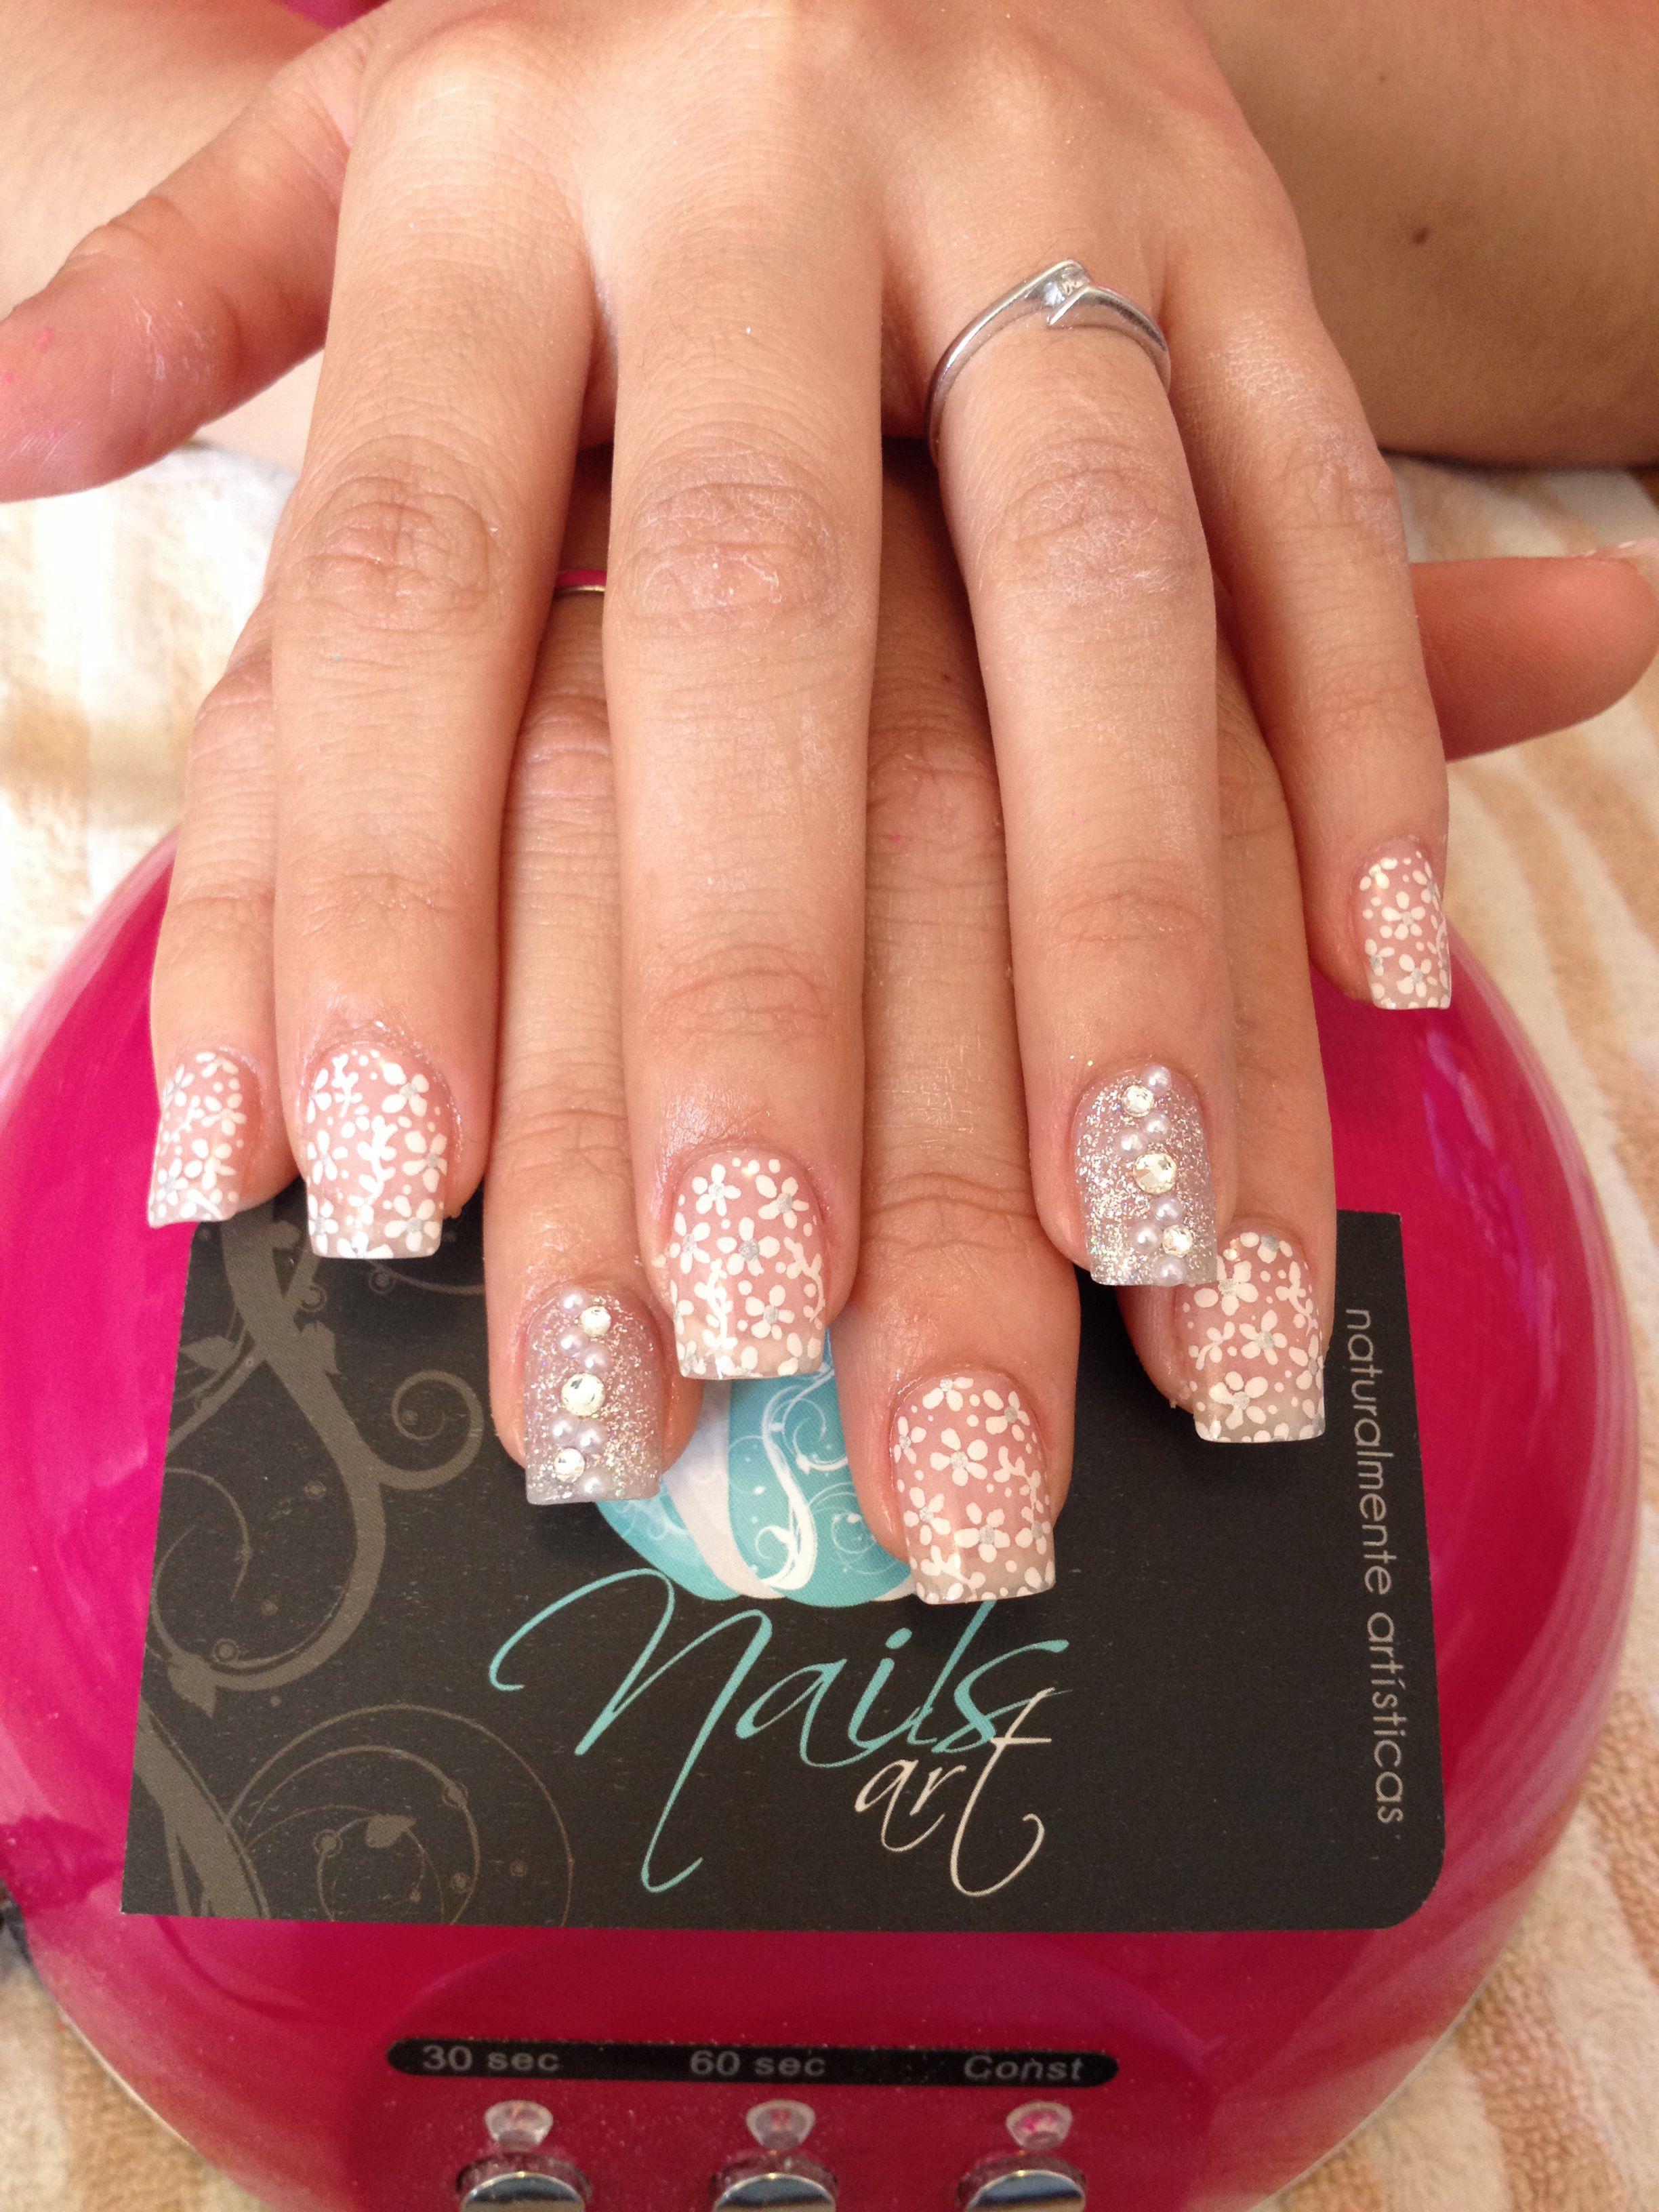 Nails art, acrylic nails, wedding nails https://www.youtube.com ...